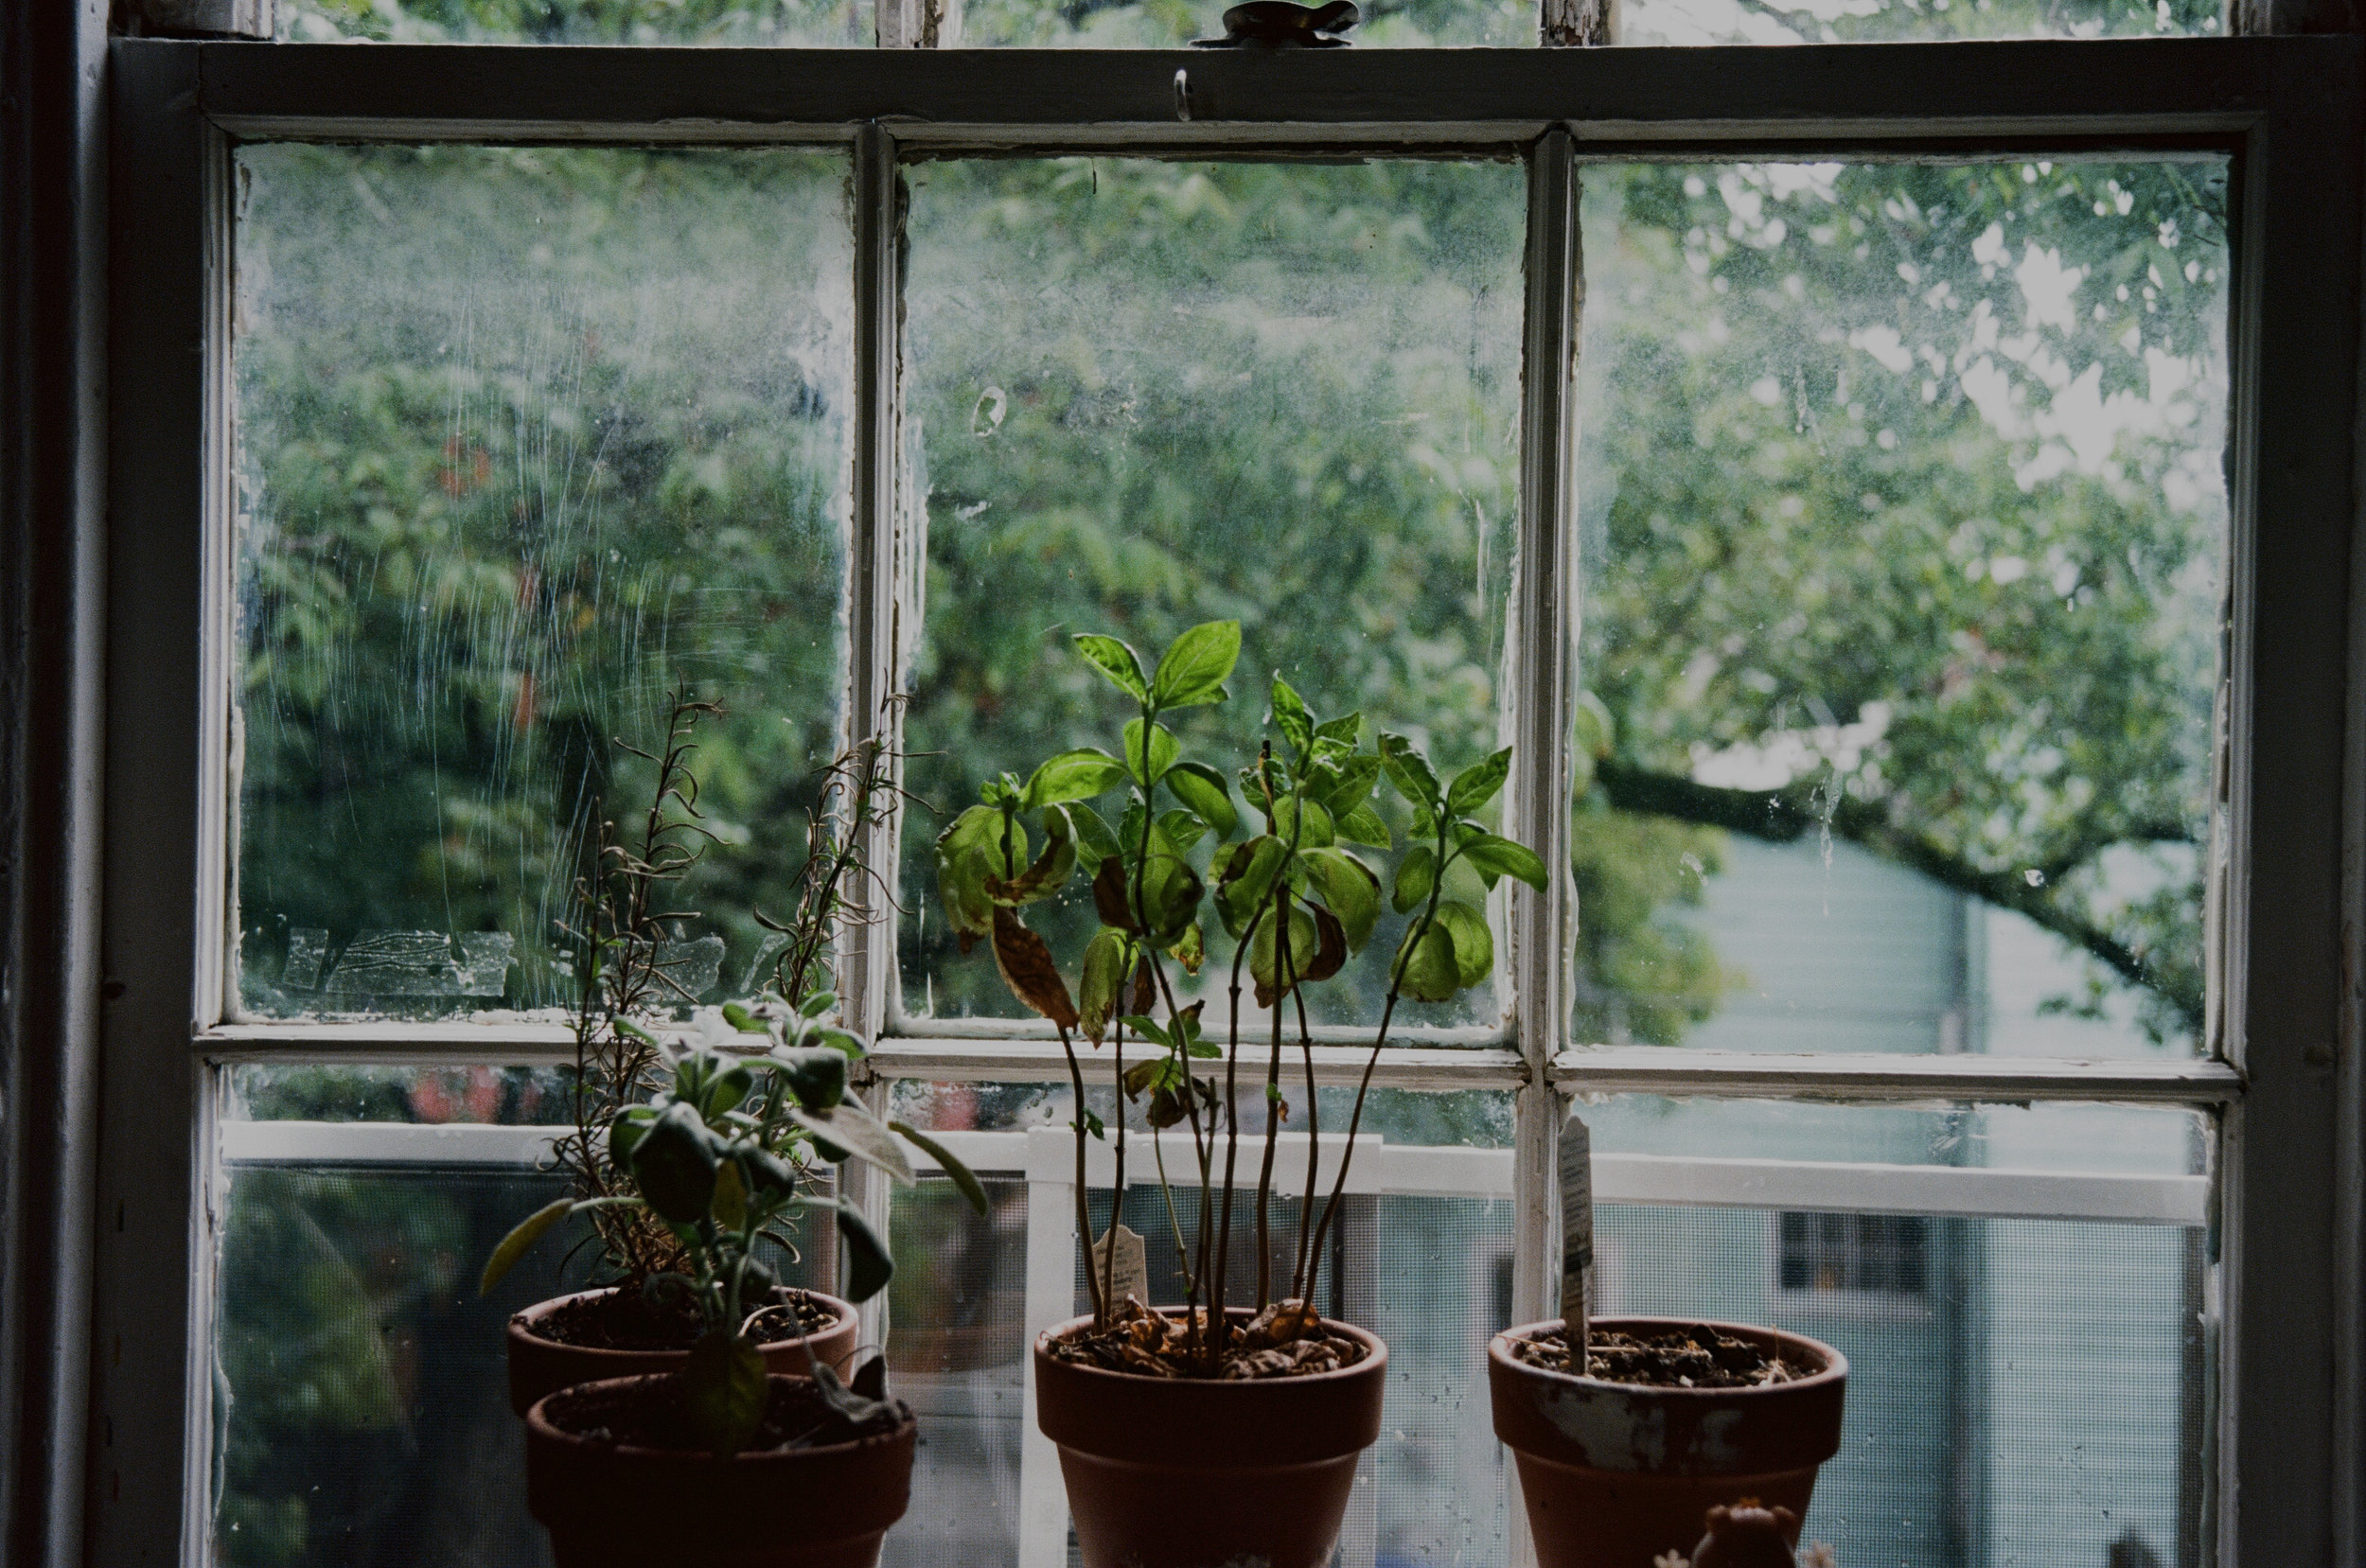 Herbs in Mary's window